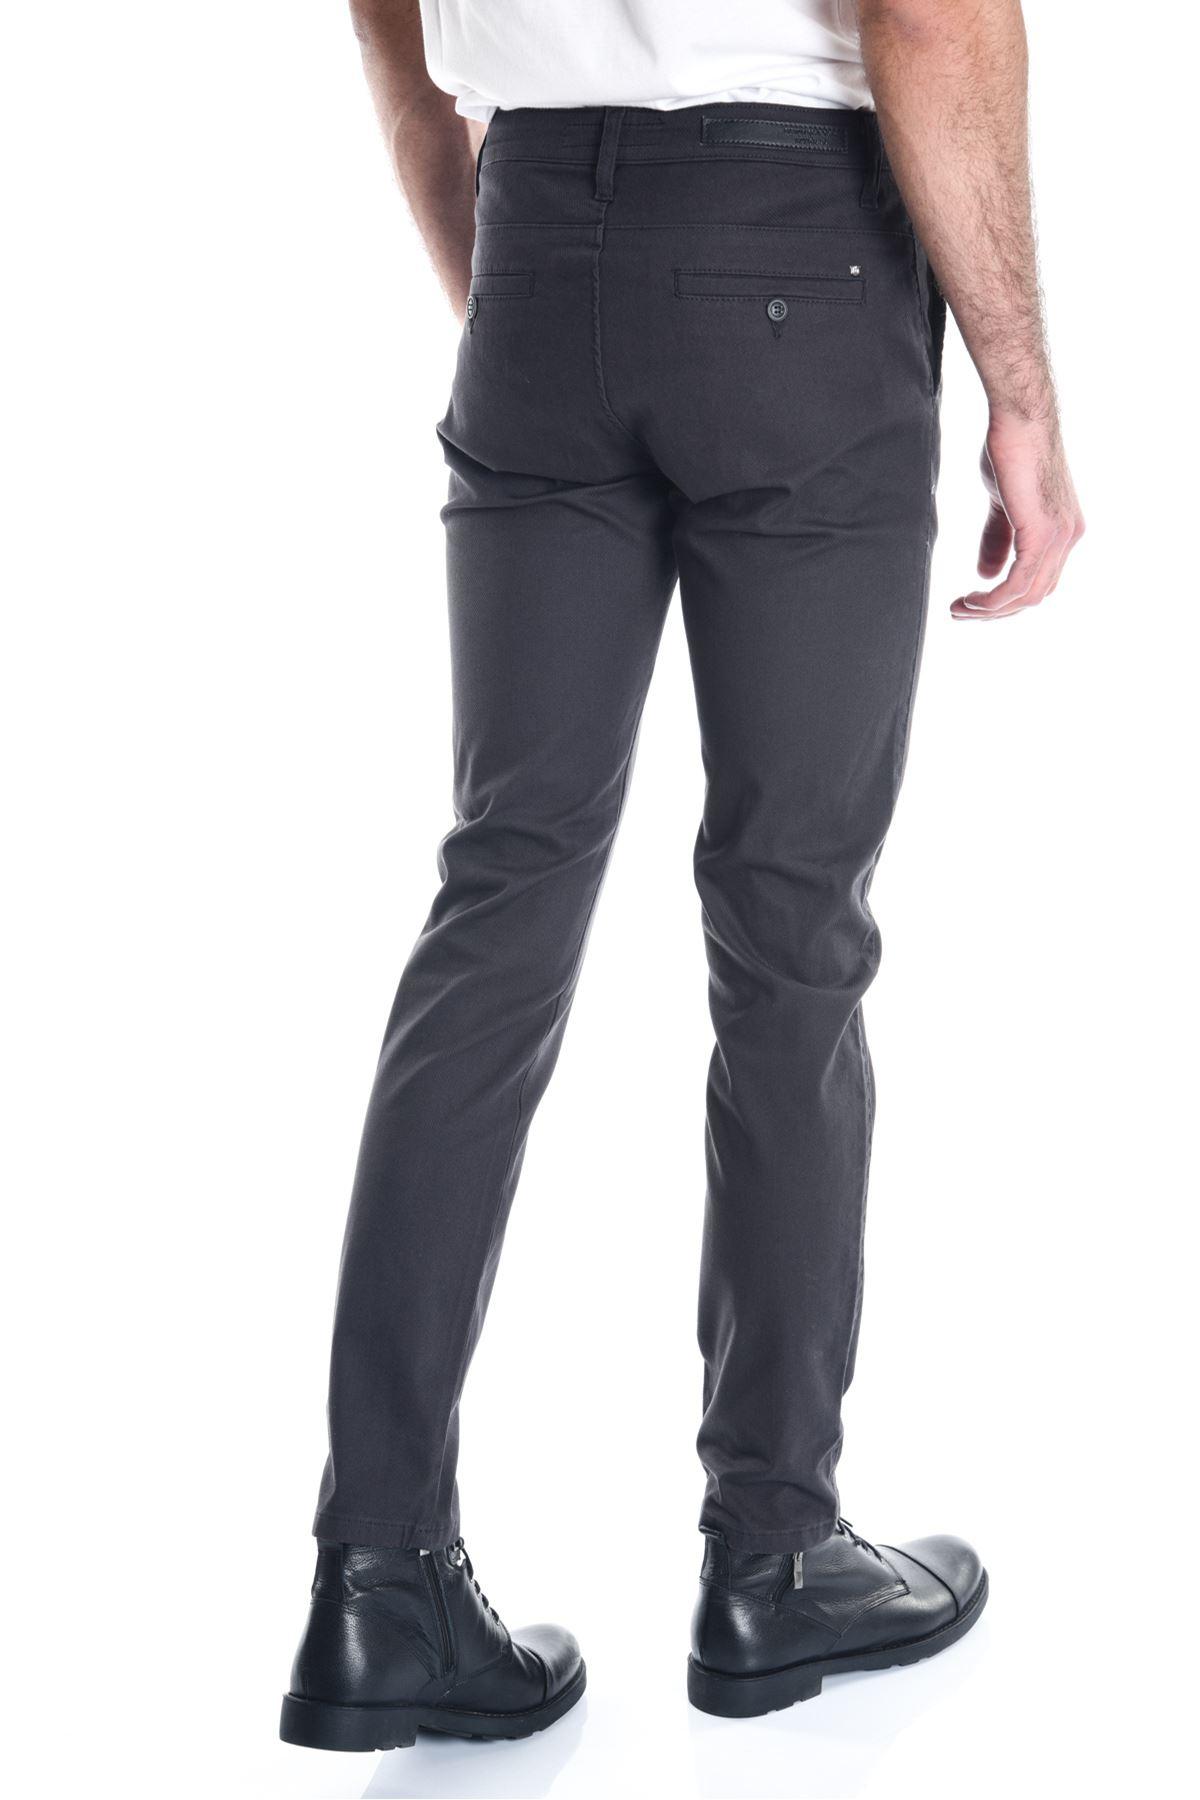 Füme Desenli Erkek Chino Pantolon